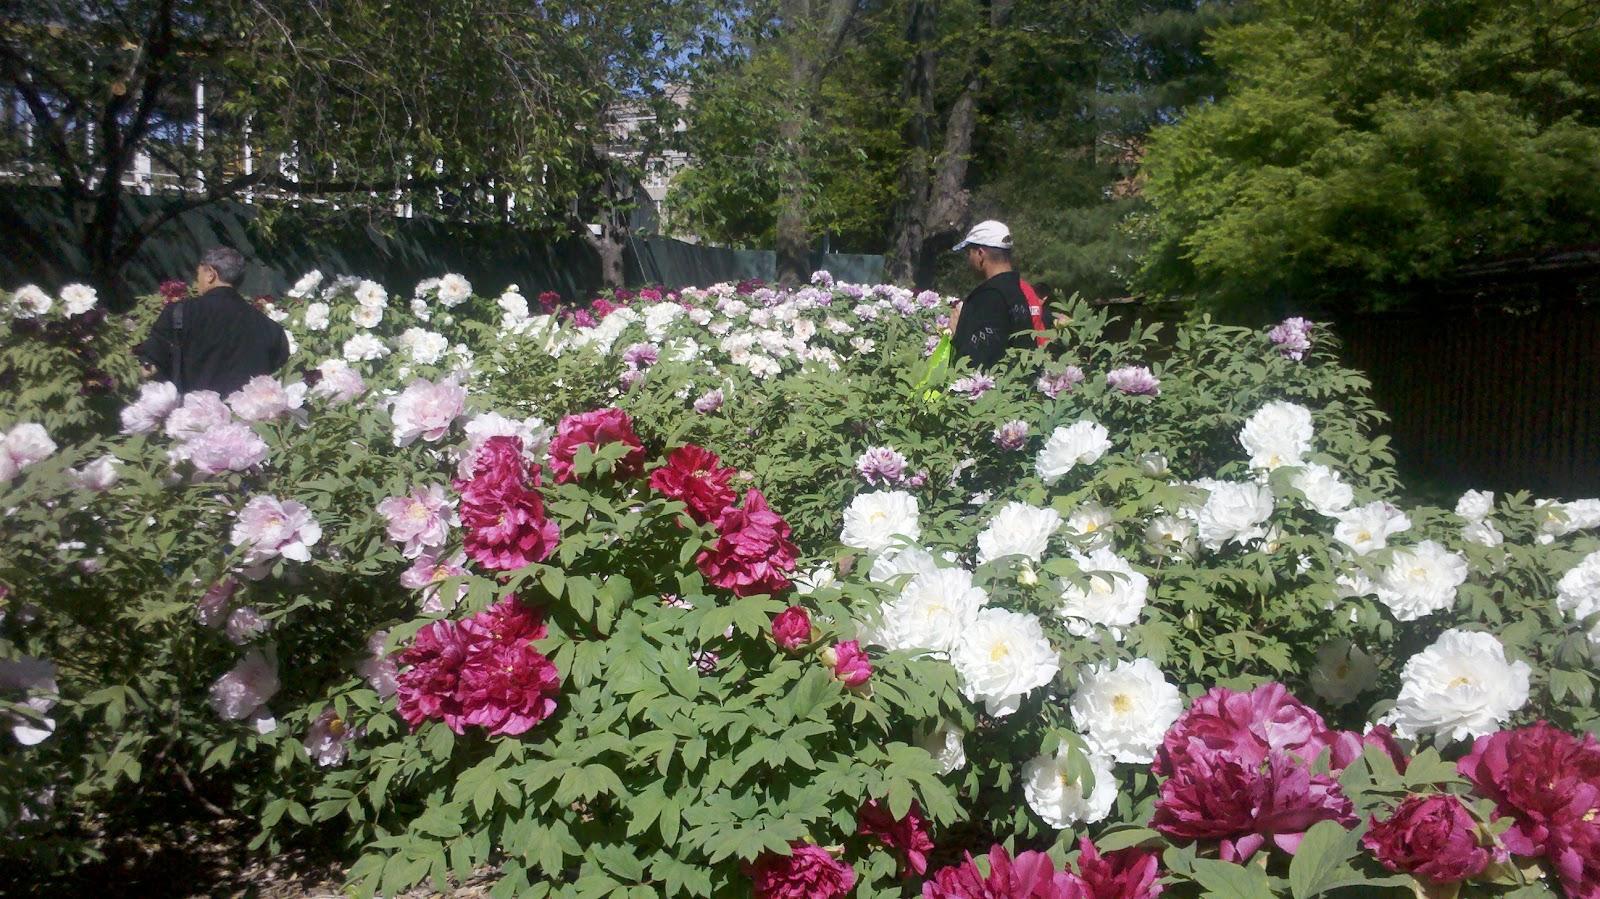 Japan Garden Flowers: Unique To NYC: Brooklyn Botanic Garden: Eastern Parkway